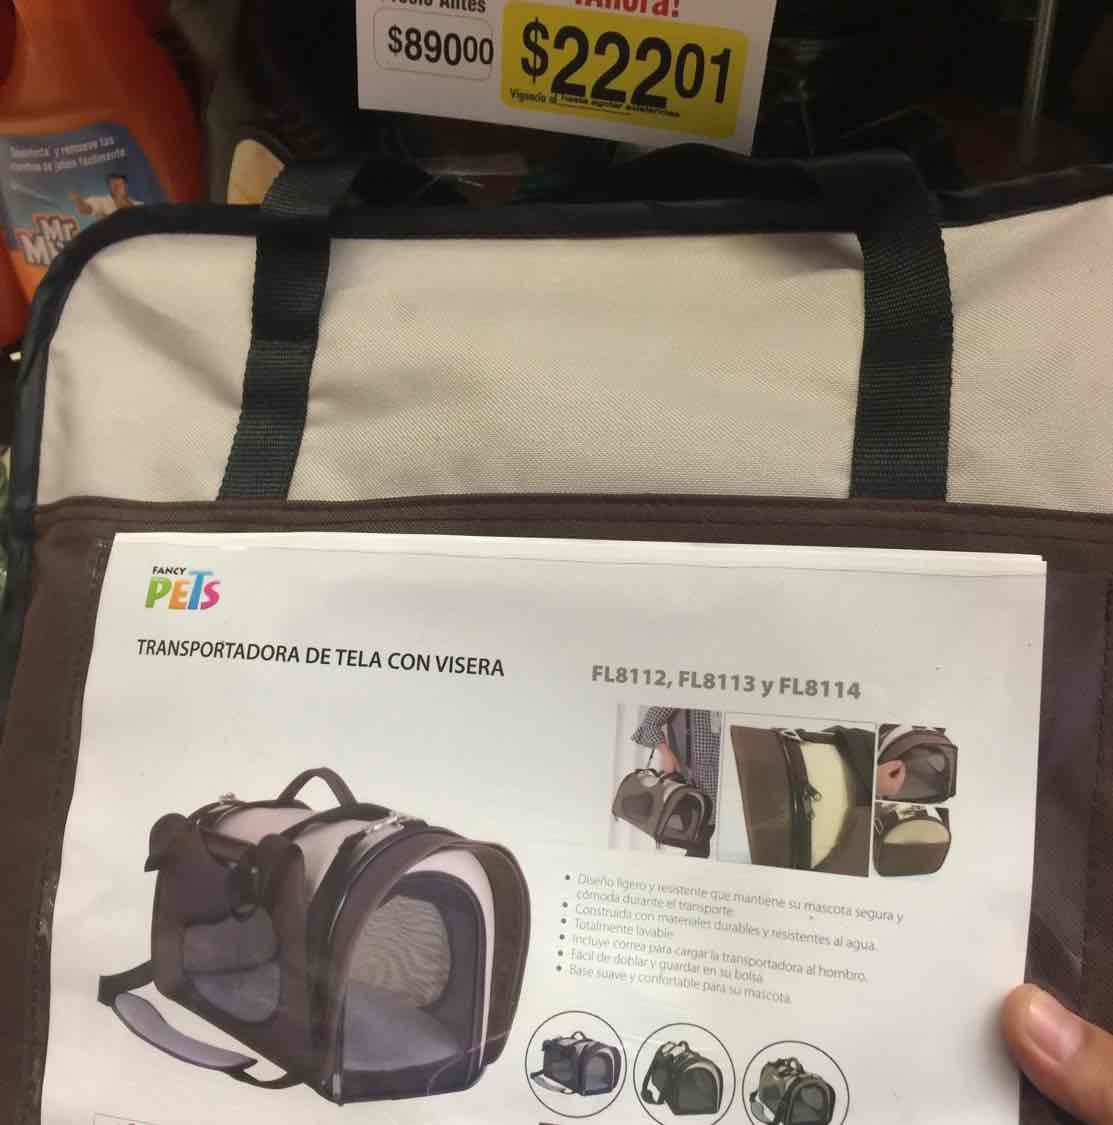 Superama Tlalpan: Transportador de mascota a $222.01